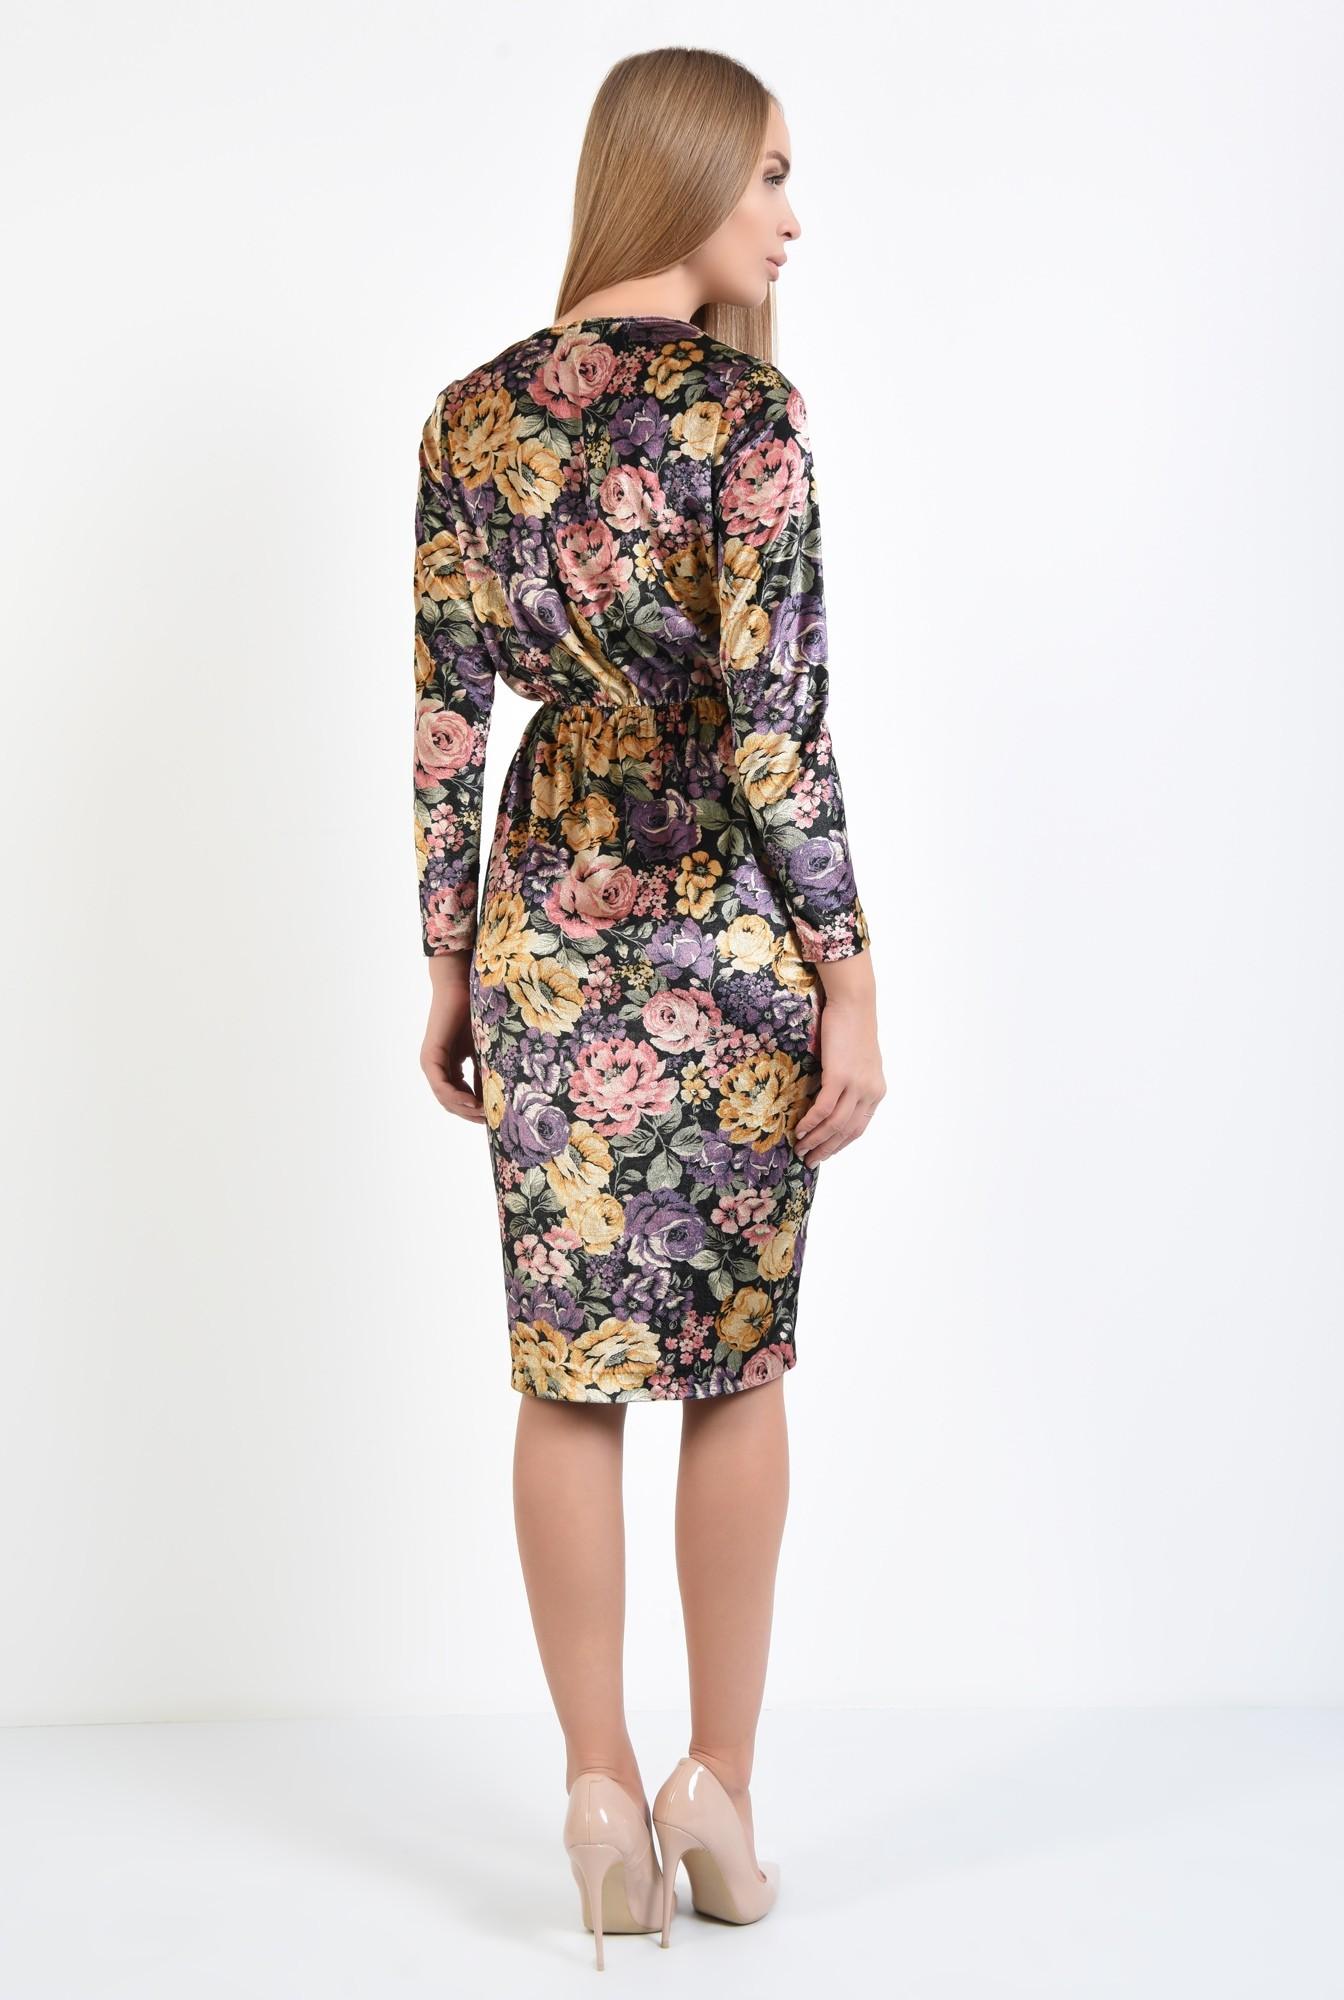 1 - rochie eleganta, imprimeu floral, midi, talie pe elastic